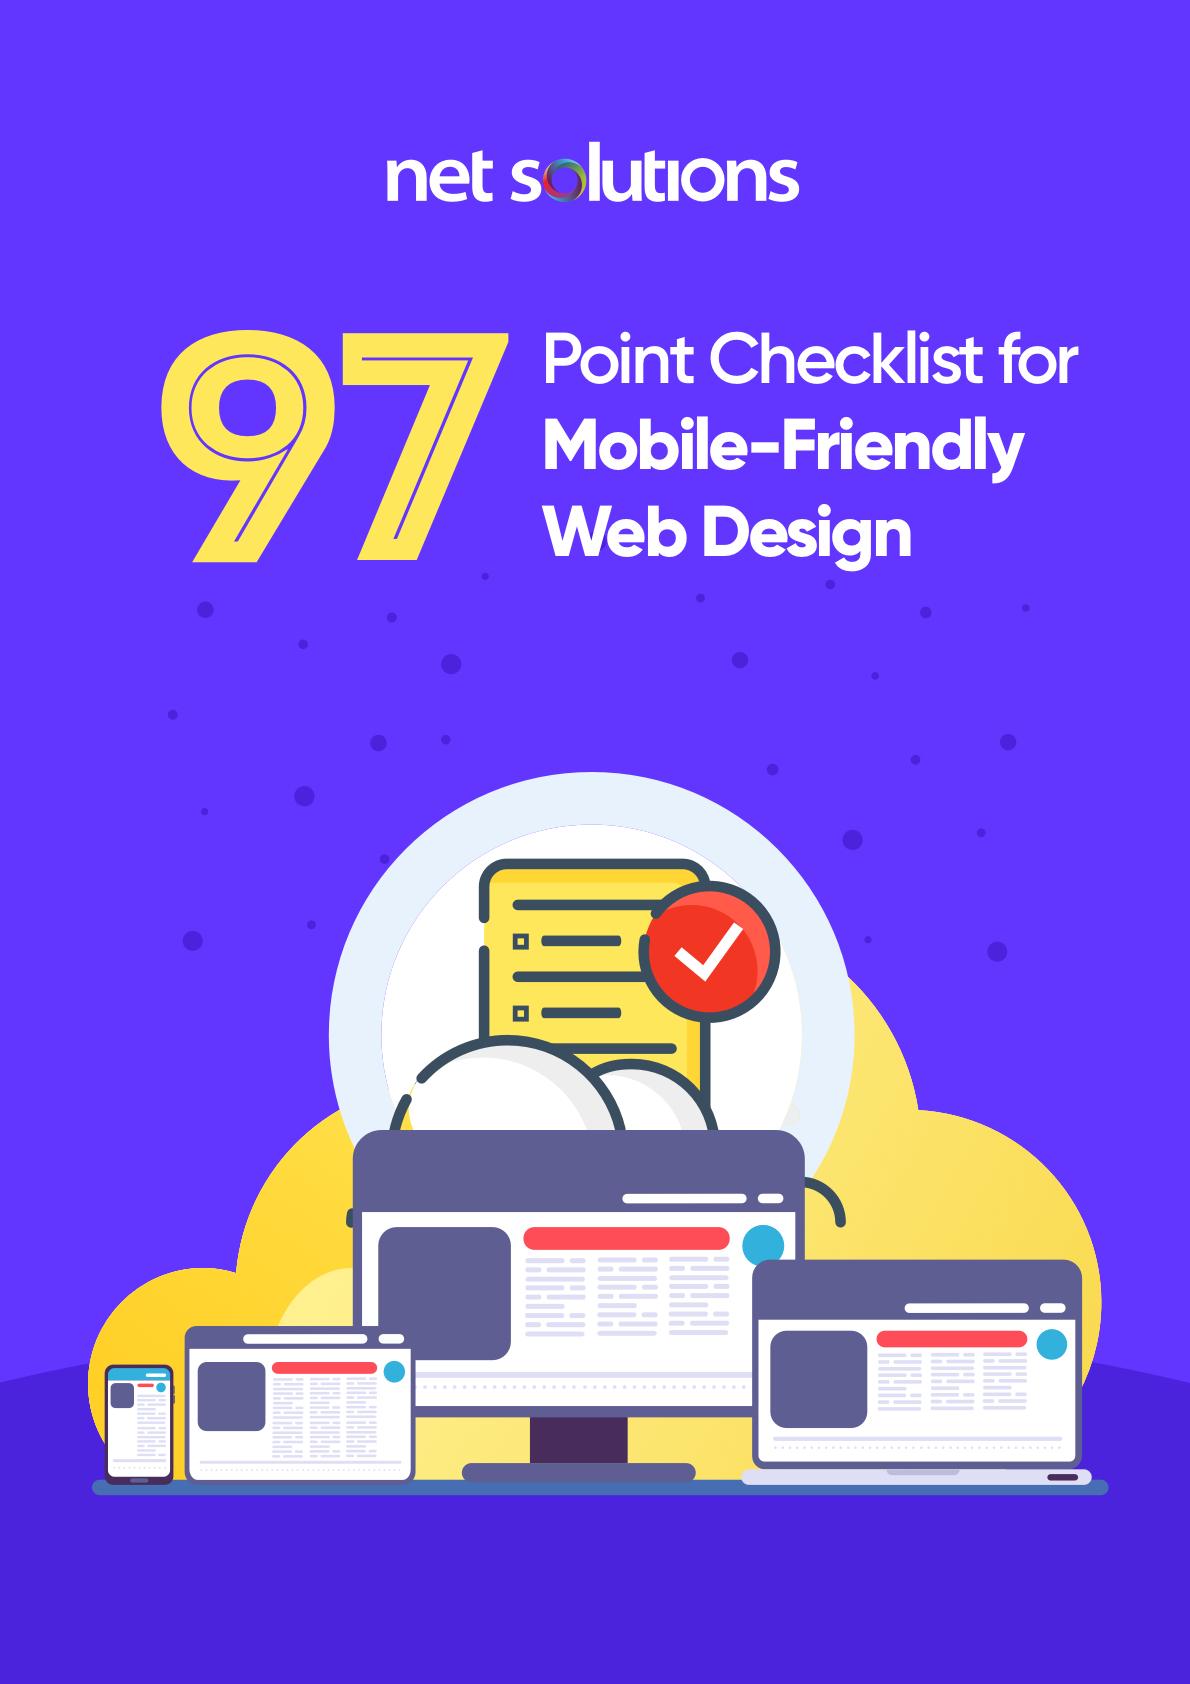 97 Point Checklist for Mobile Friendly Web Design